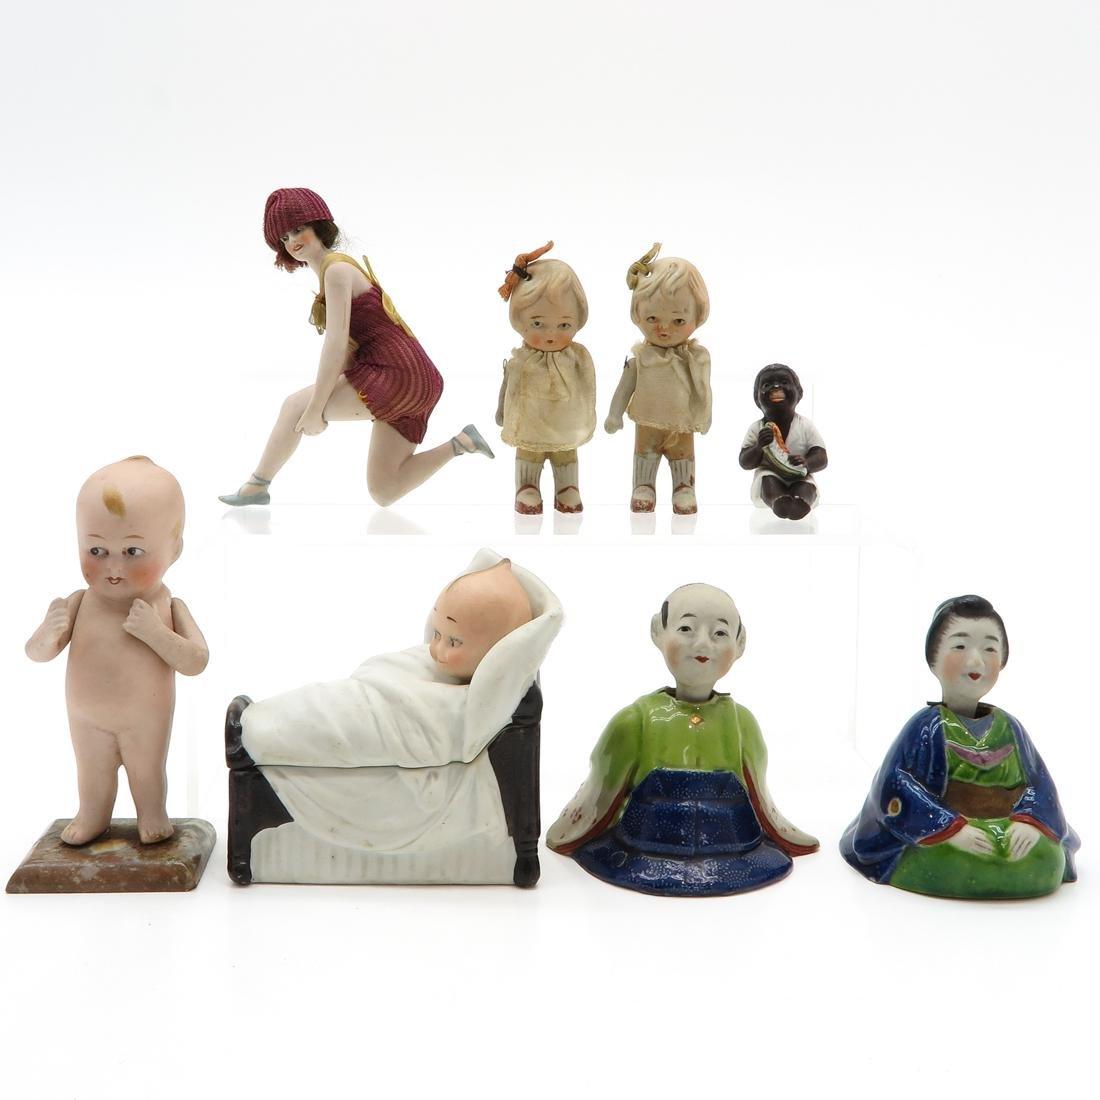 Diverse Lot of 8 Dolls